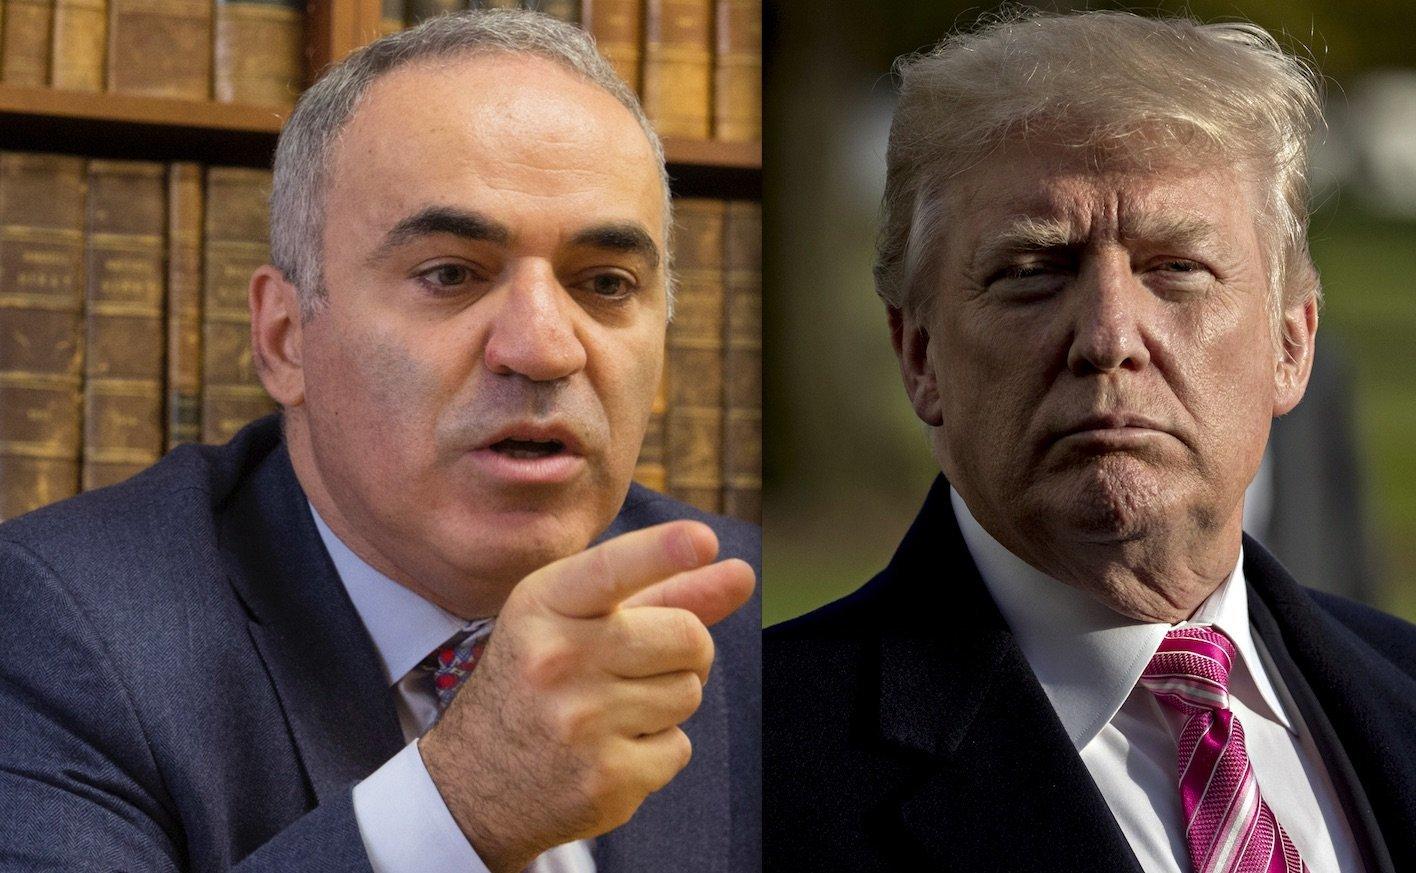 Garry Kasparov and Donald Trump